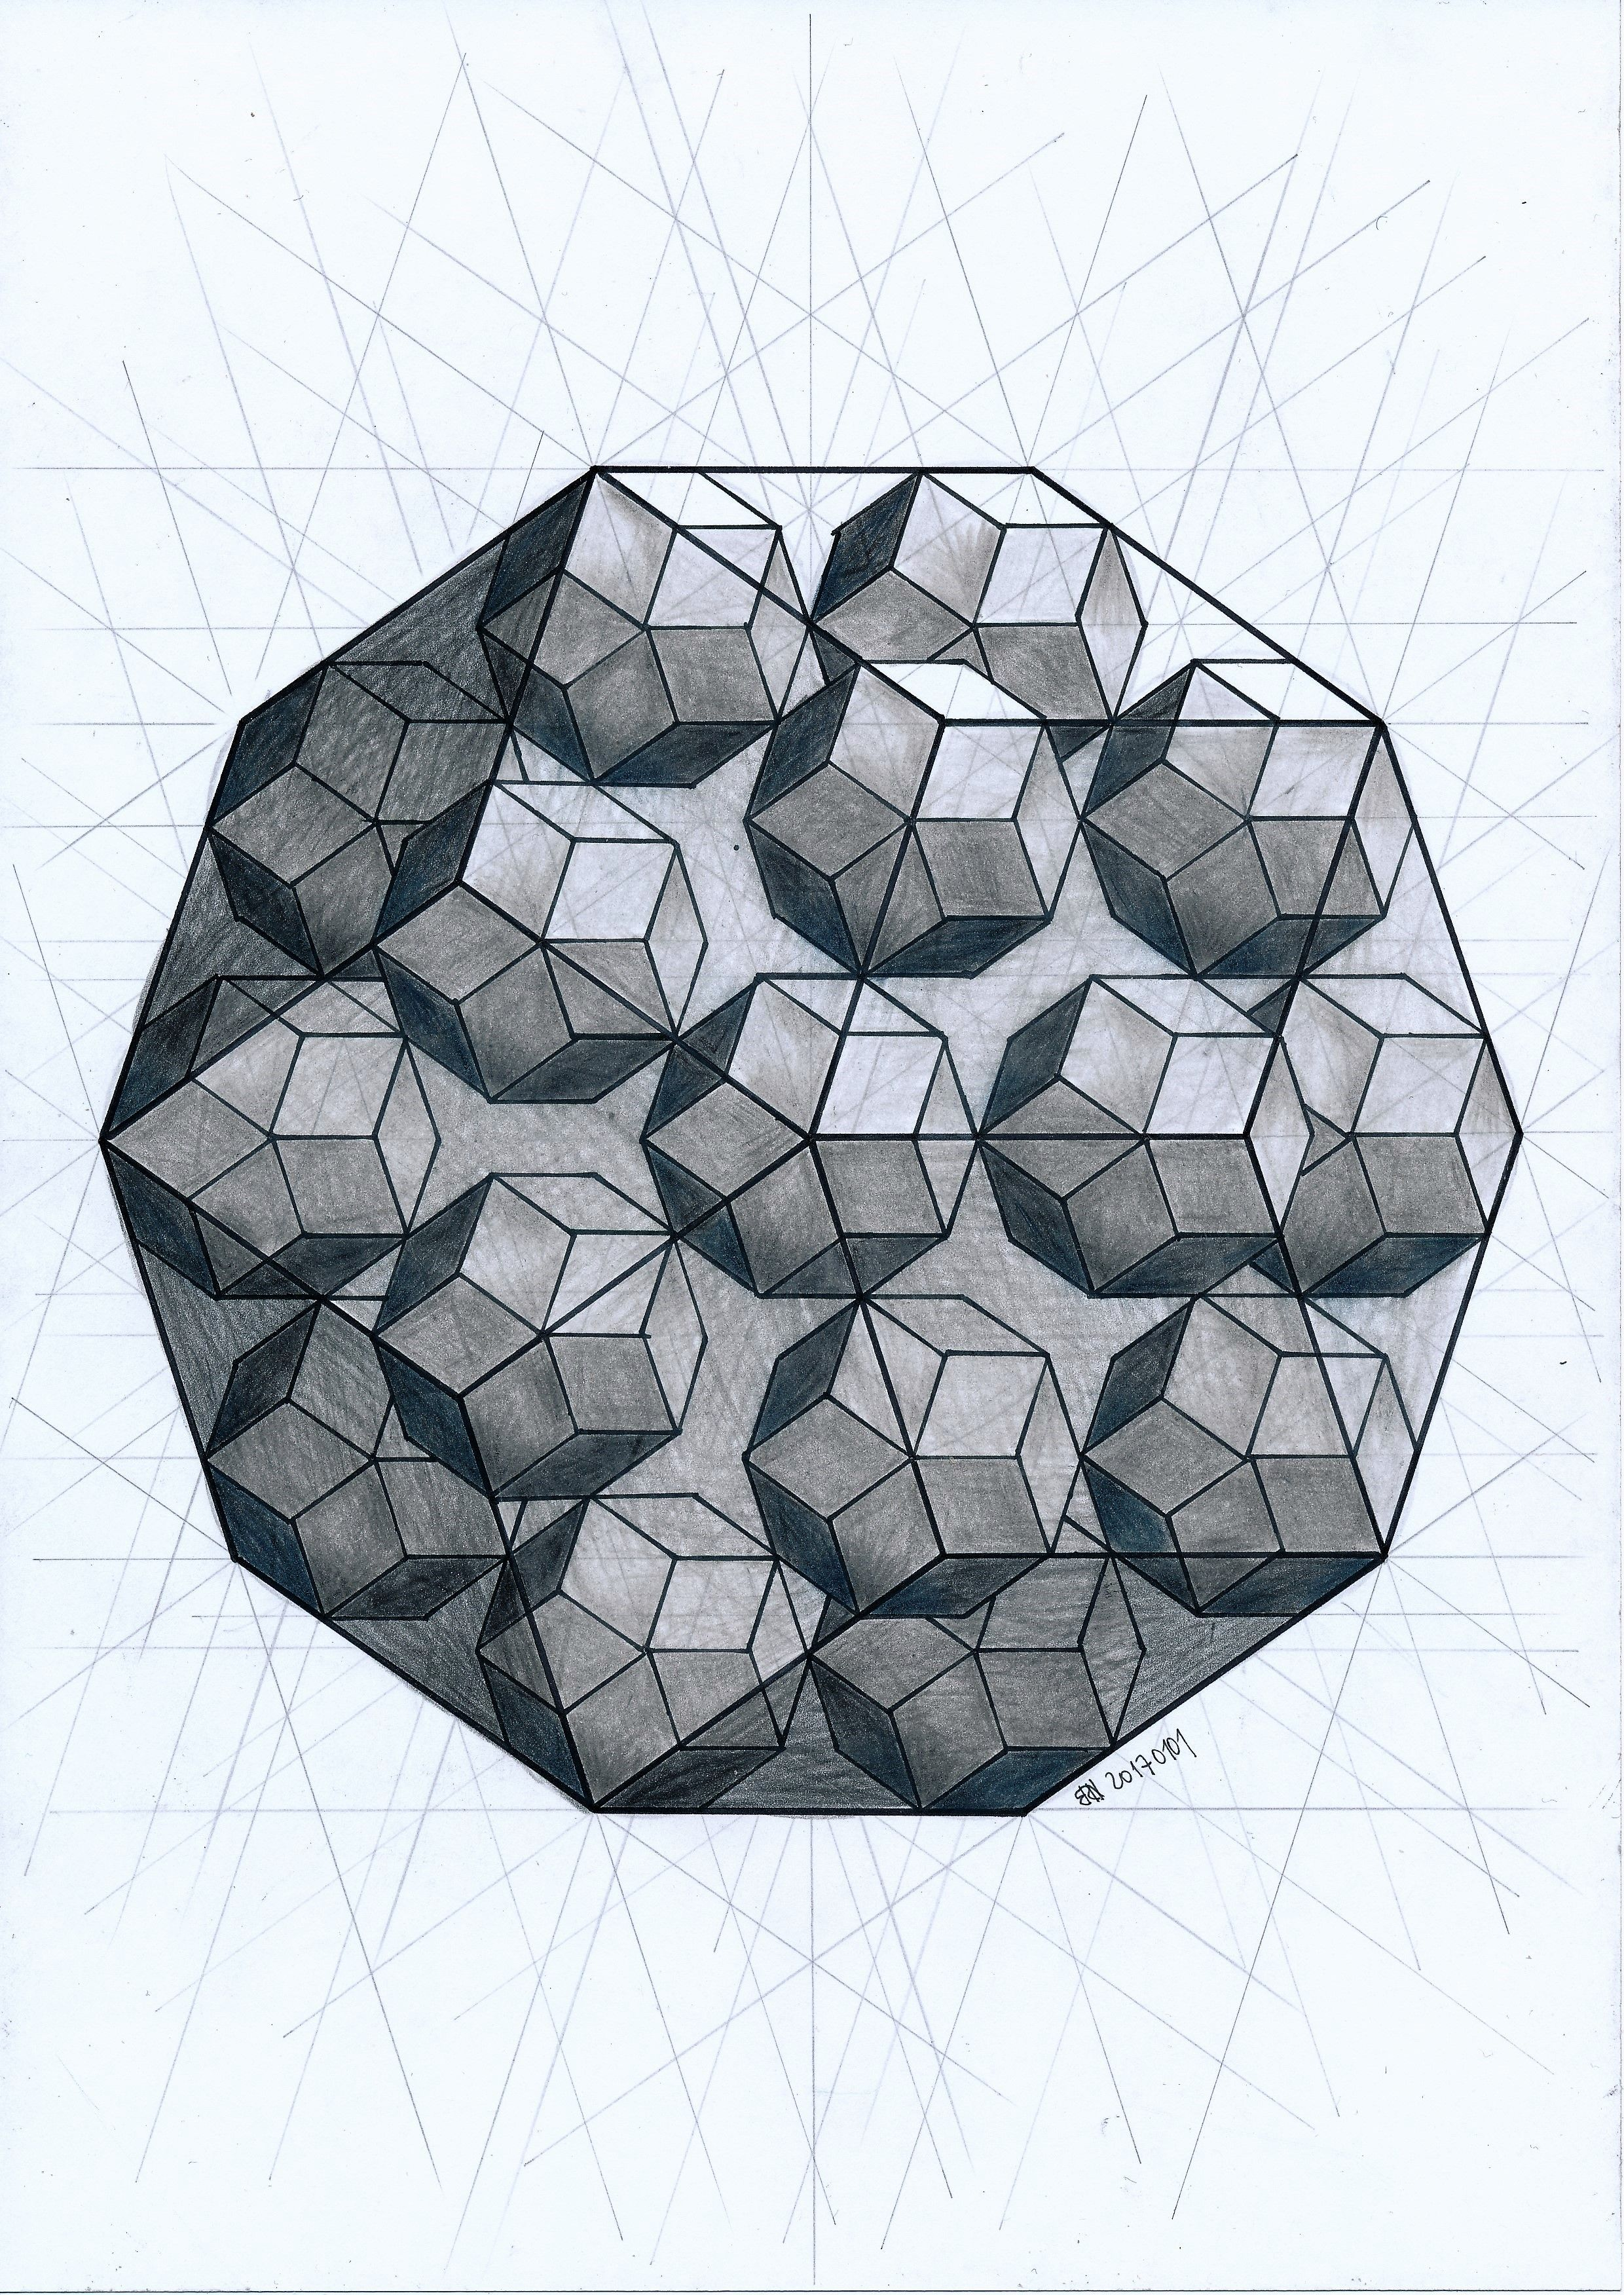 Polyhedron Solid Geometry Symmetry Pentagon Penrose